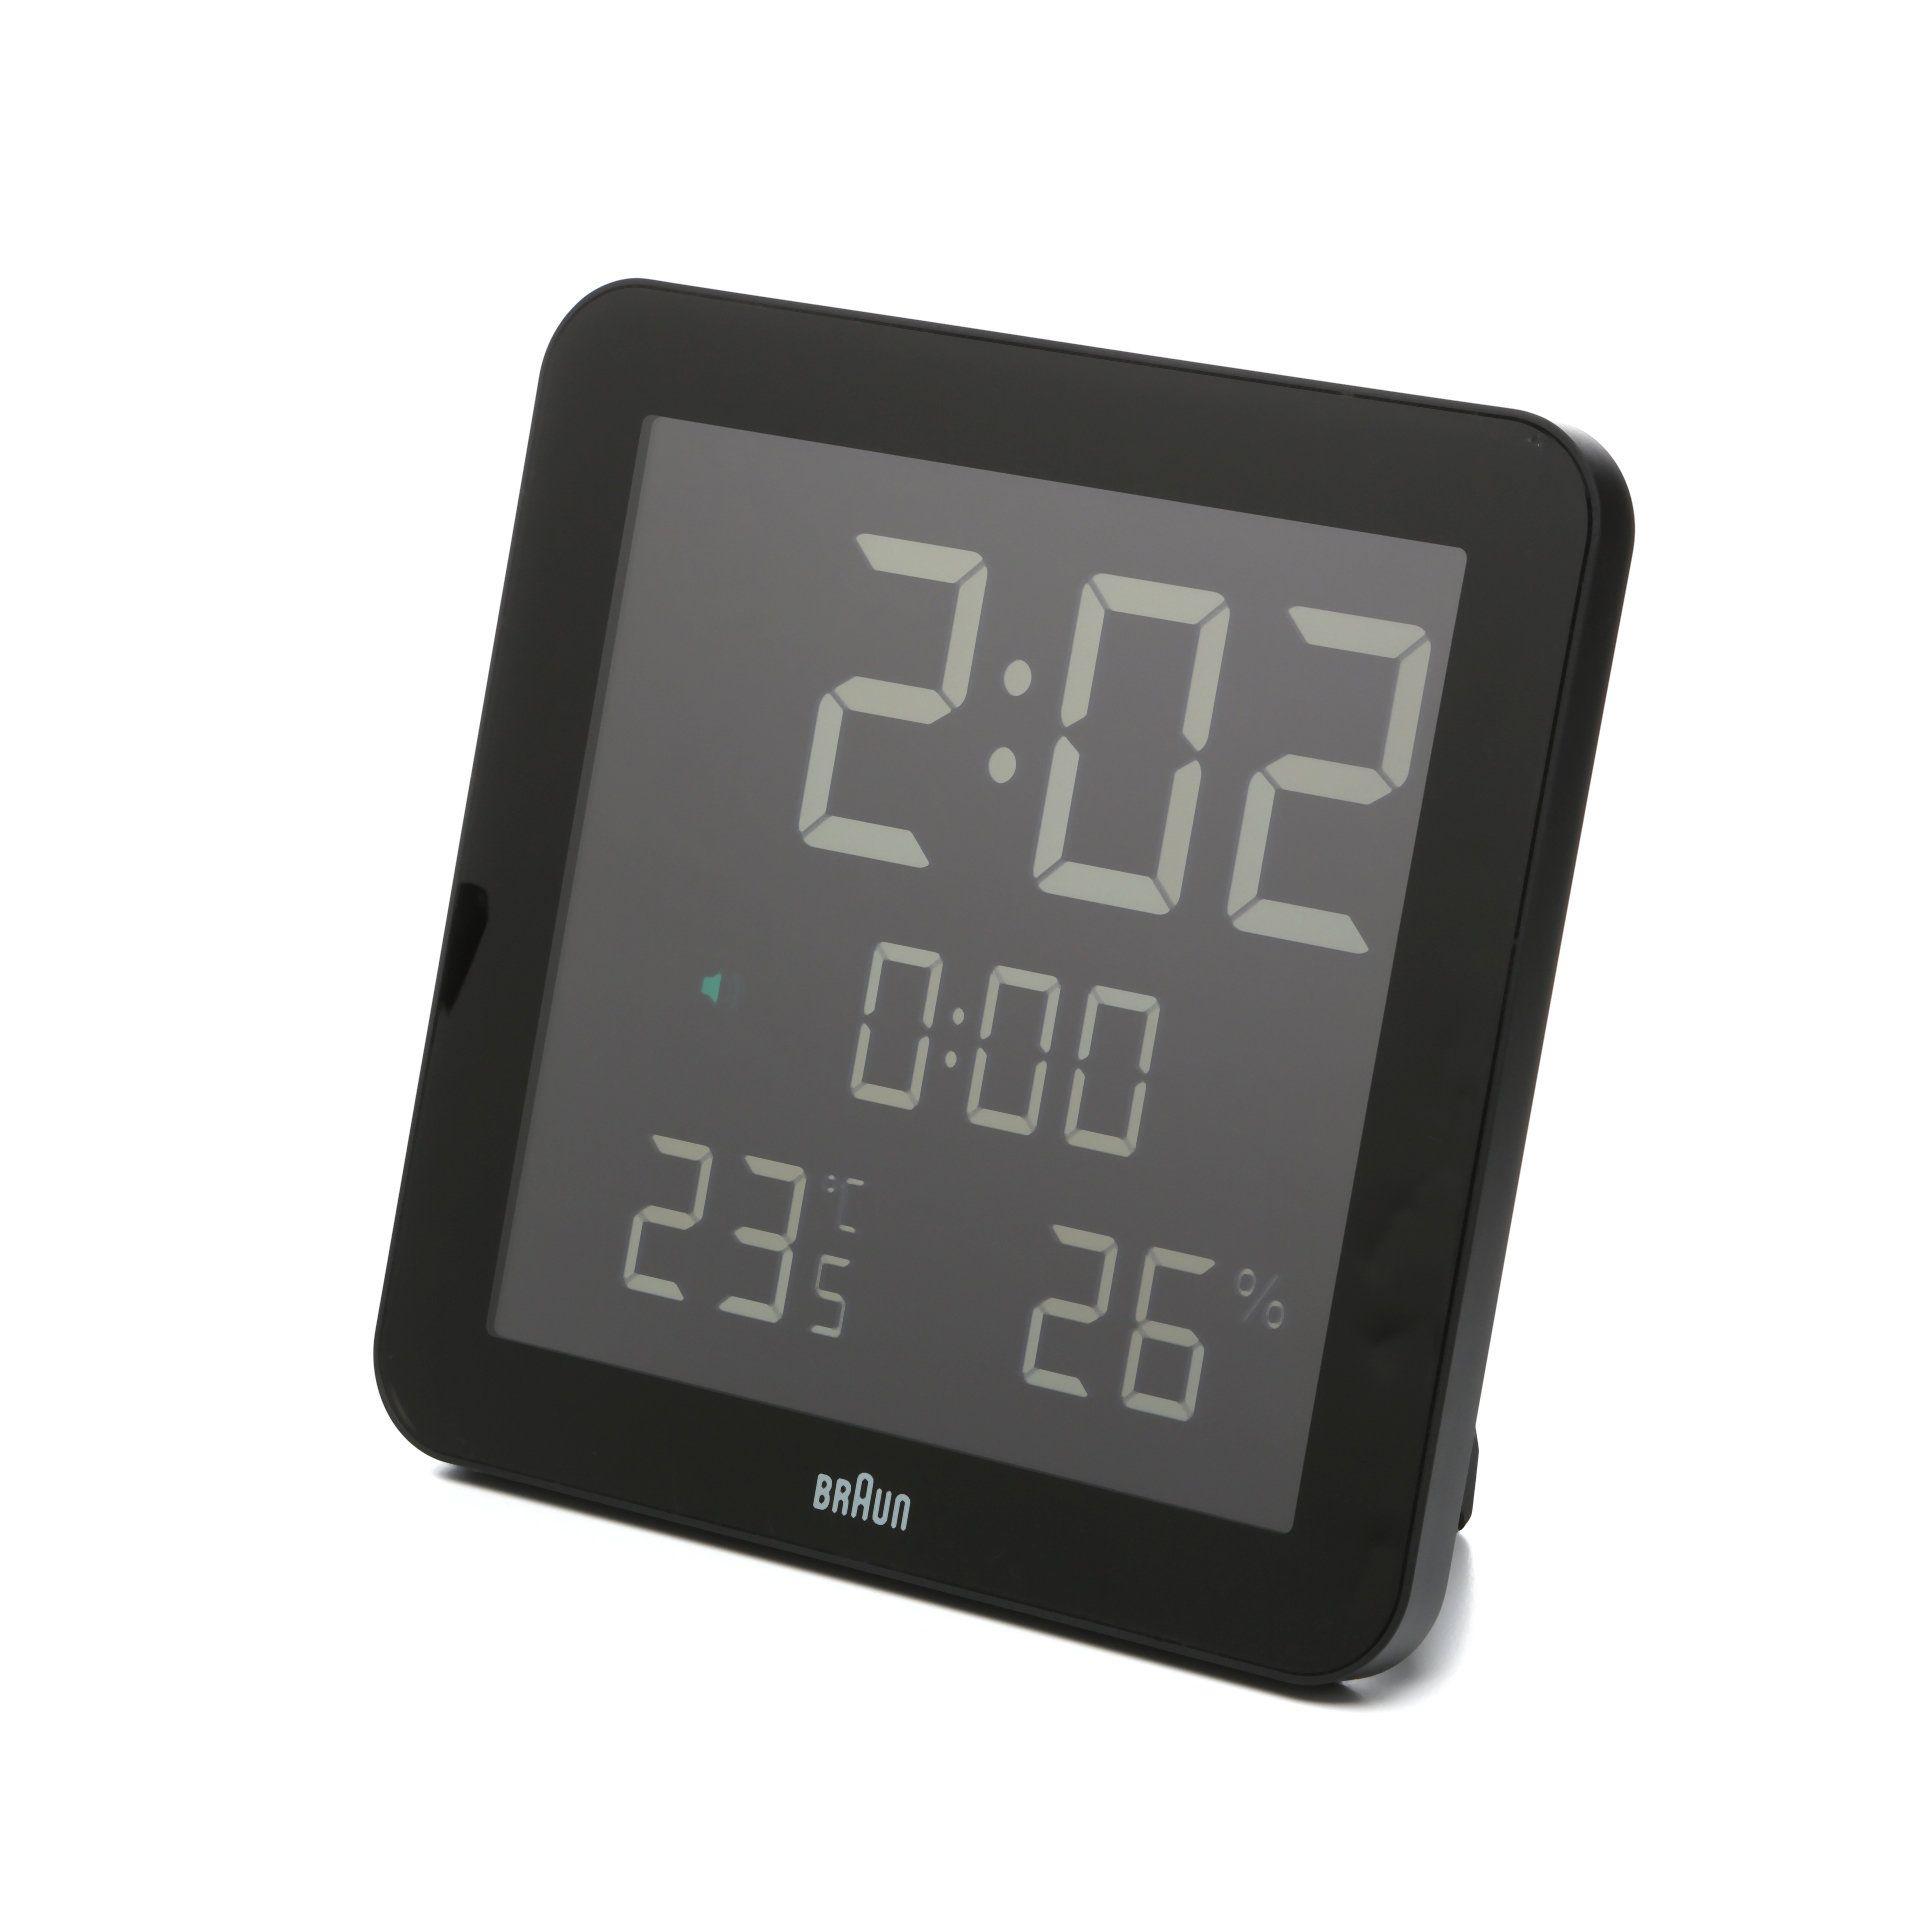 Digital Wall Clock Clock Digital Wall Tabletop Clocks